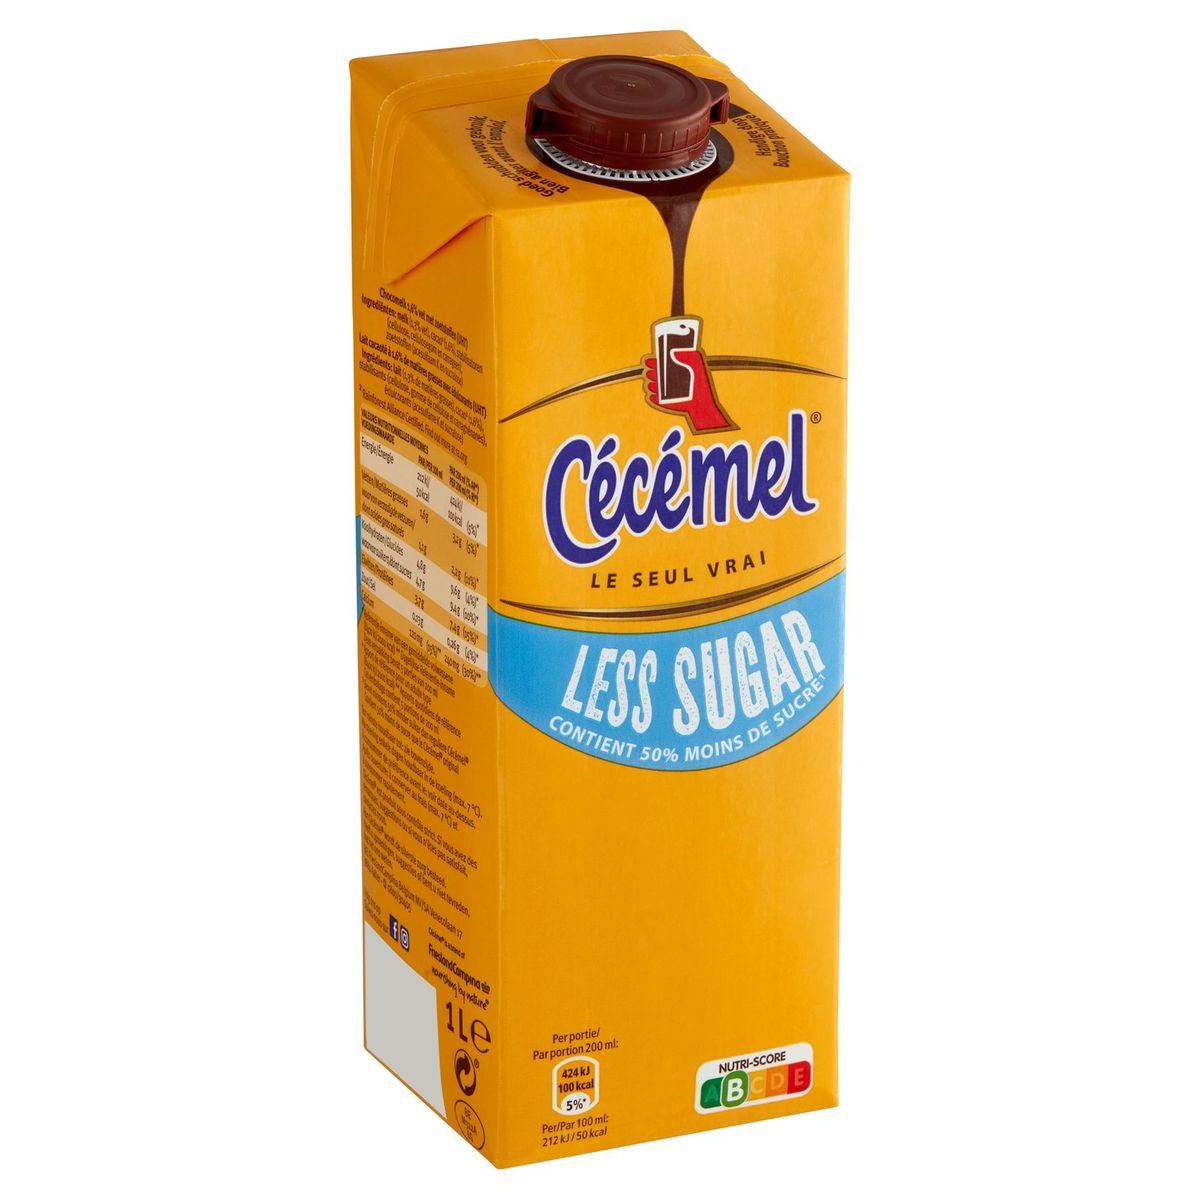 Cécémel Less Sugar 1 L